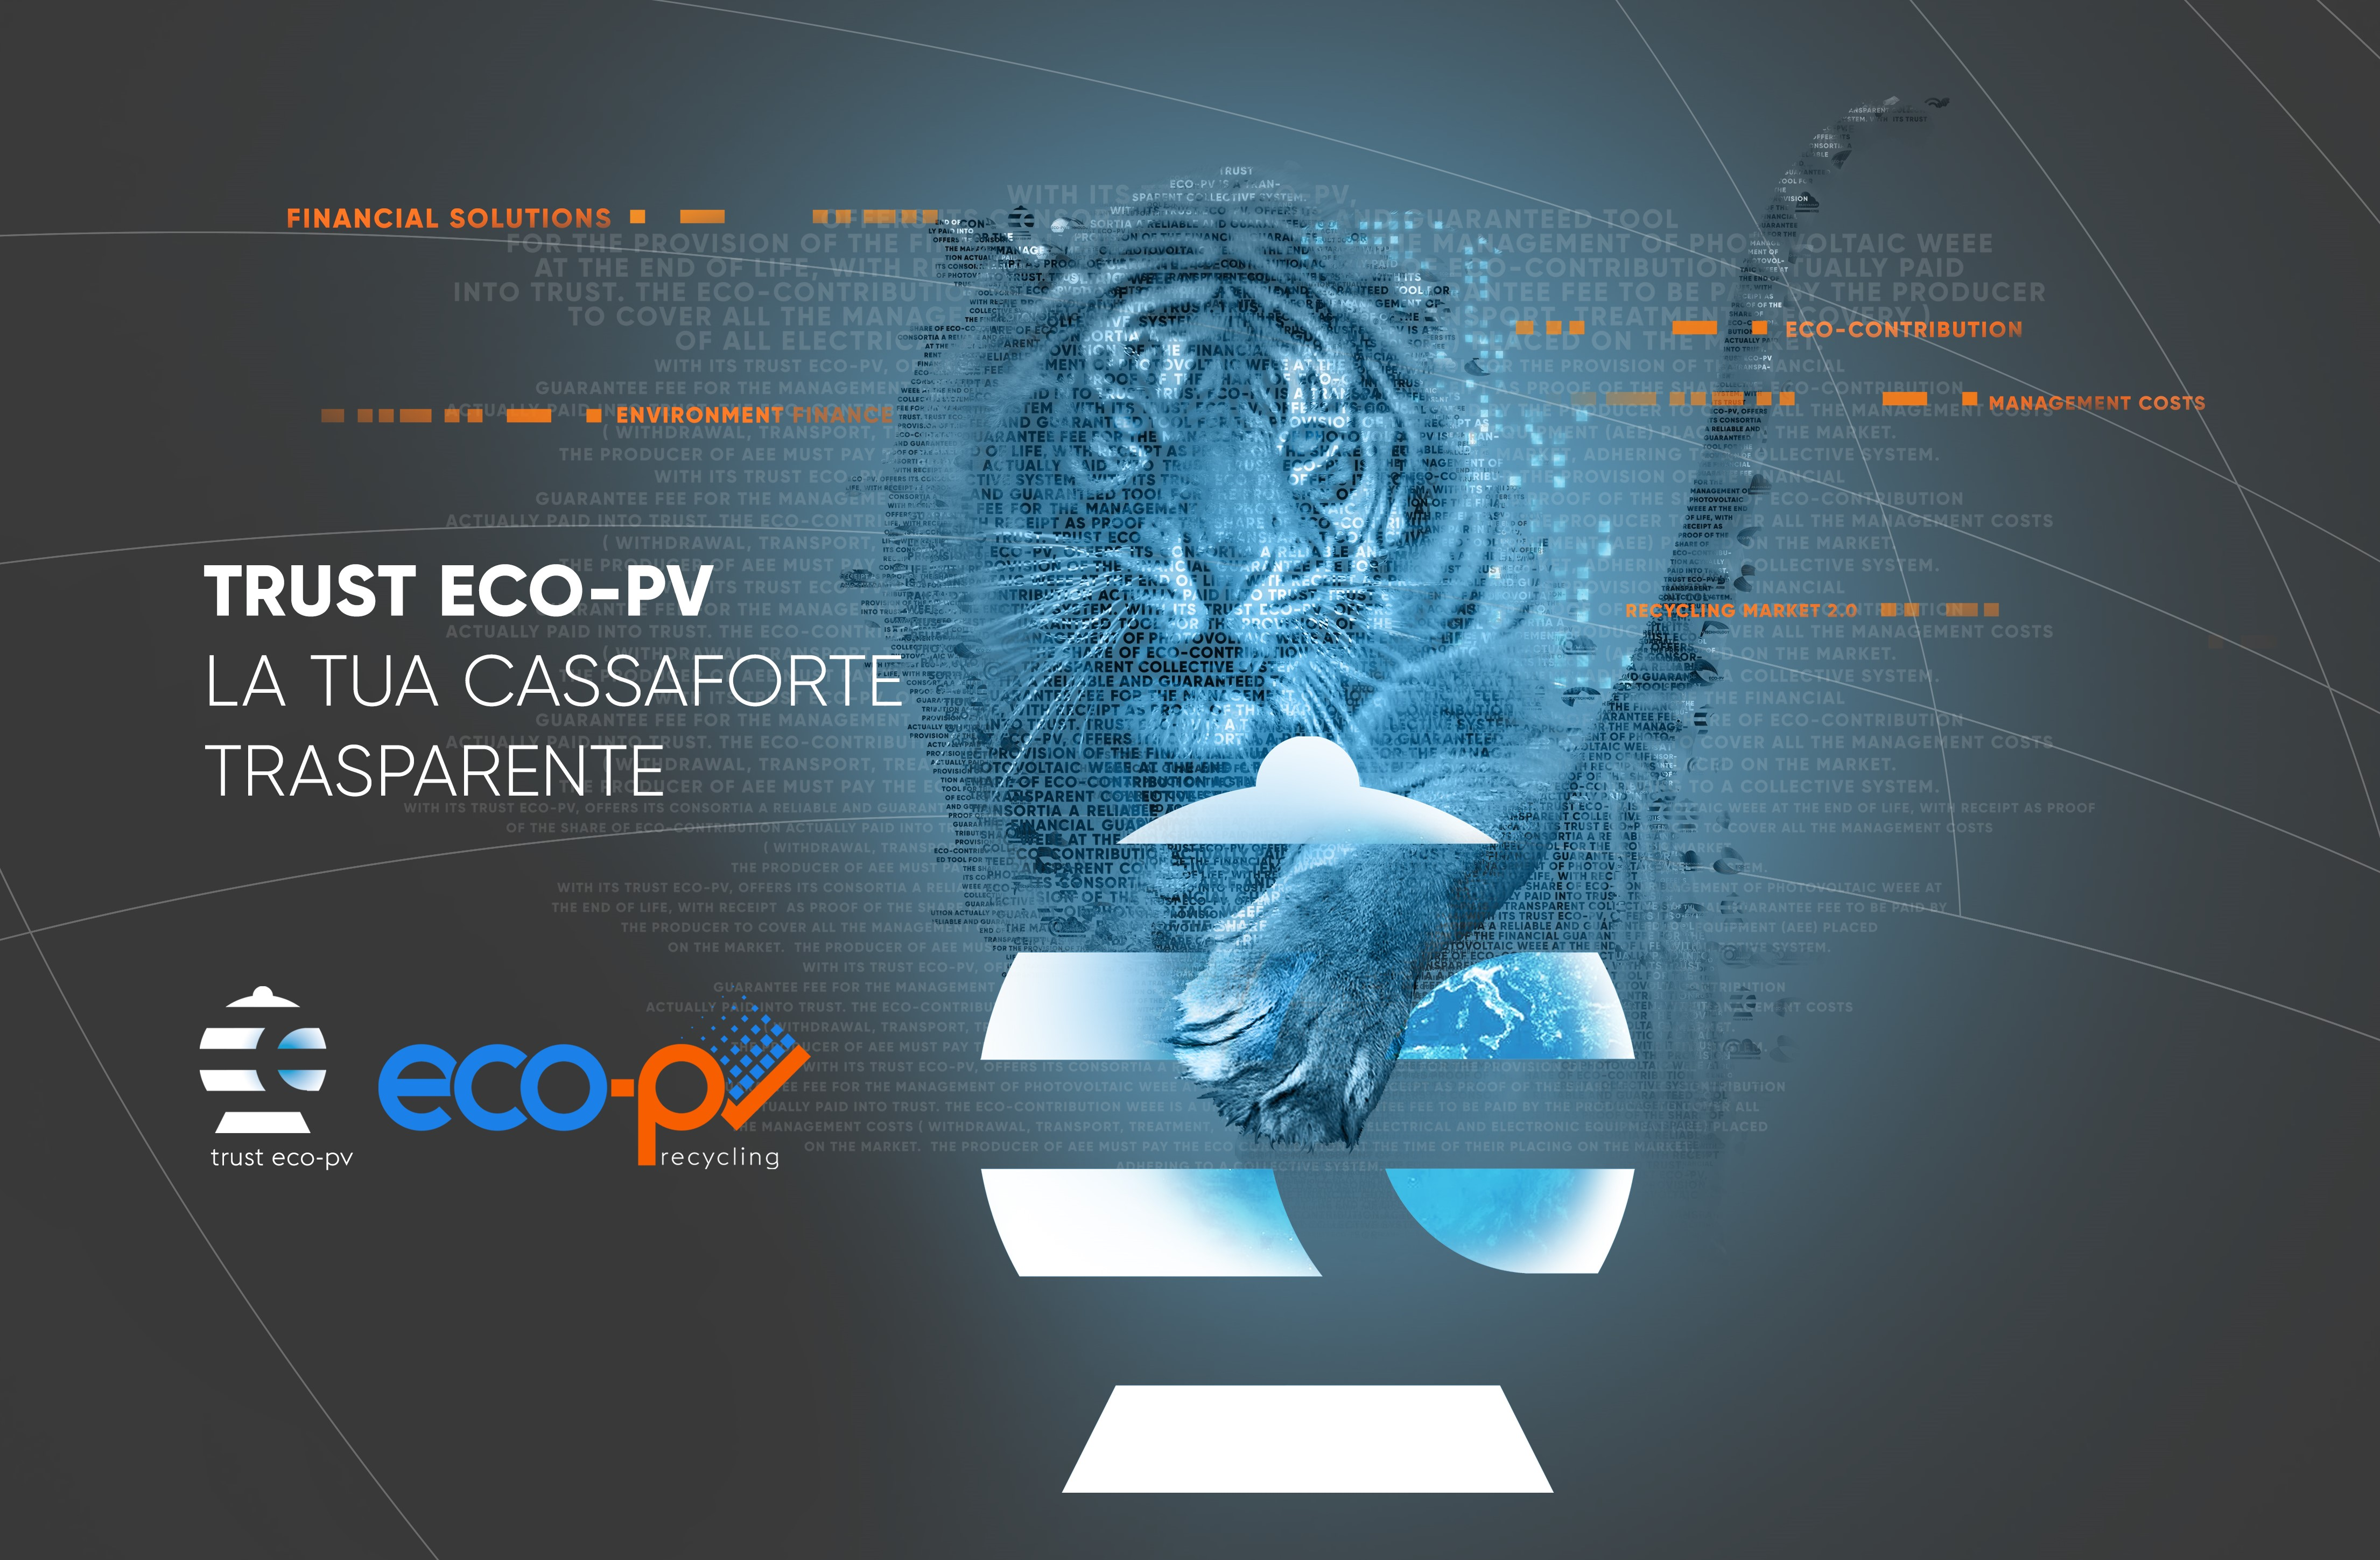 trust eco-pv home page design 2021